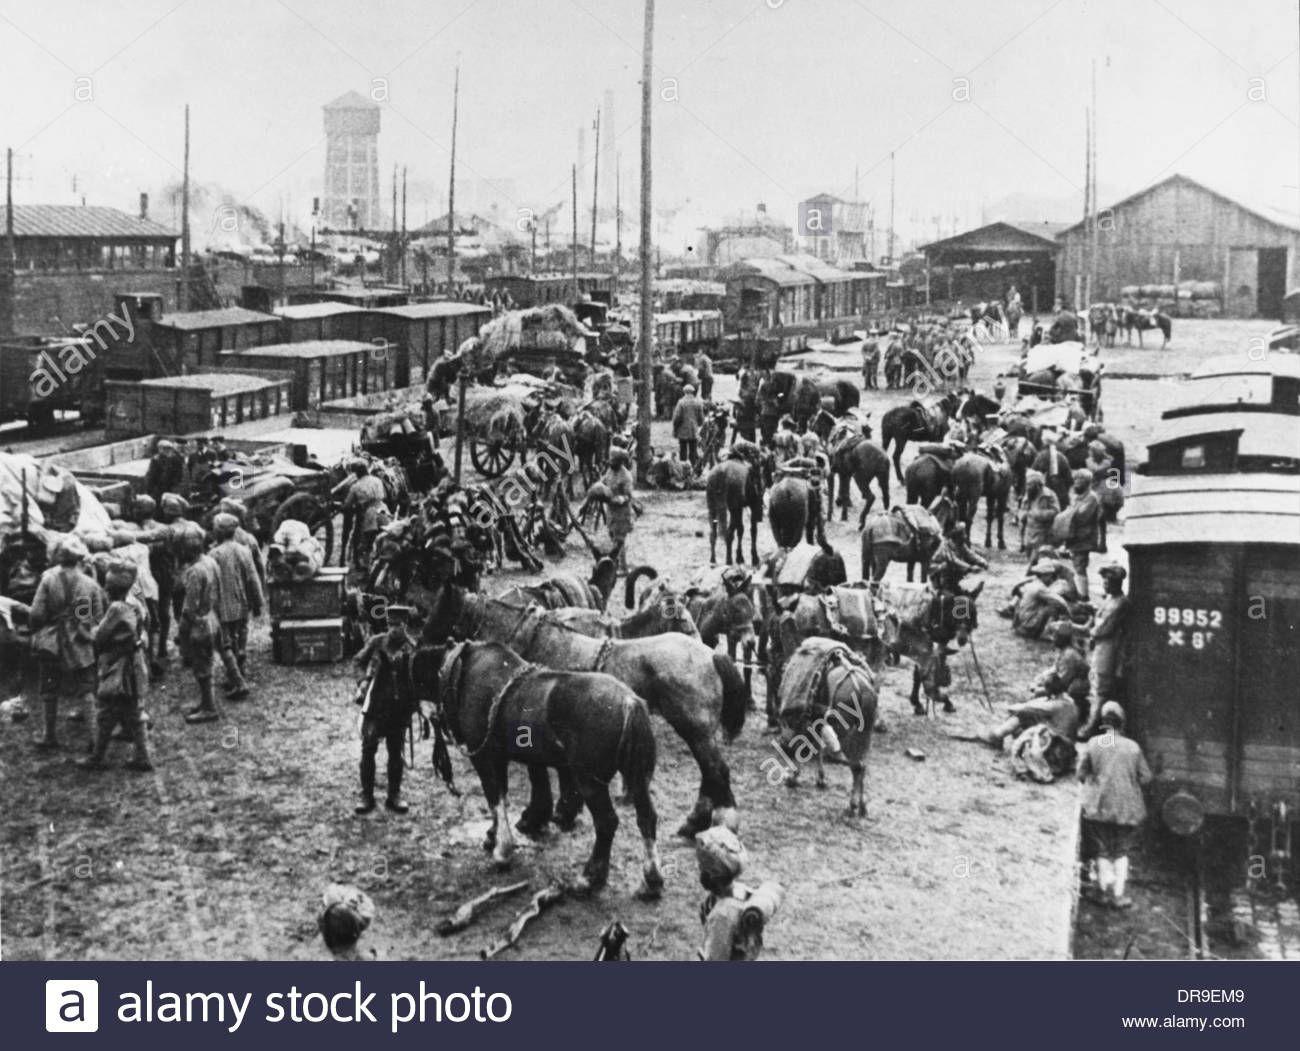 Indian Cavalry Regiment 1914 Stock Photo | 'British' Indian